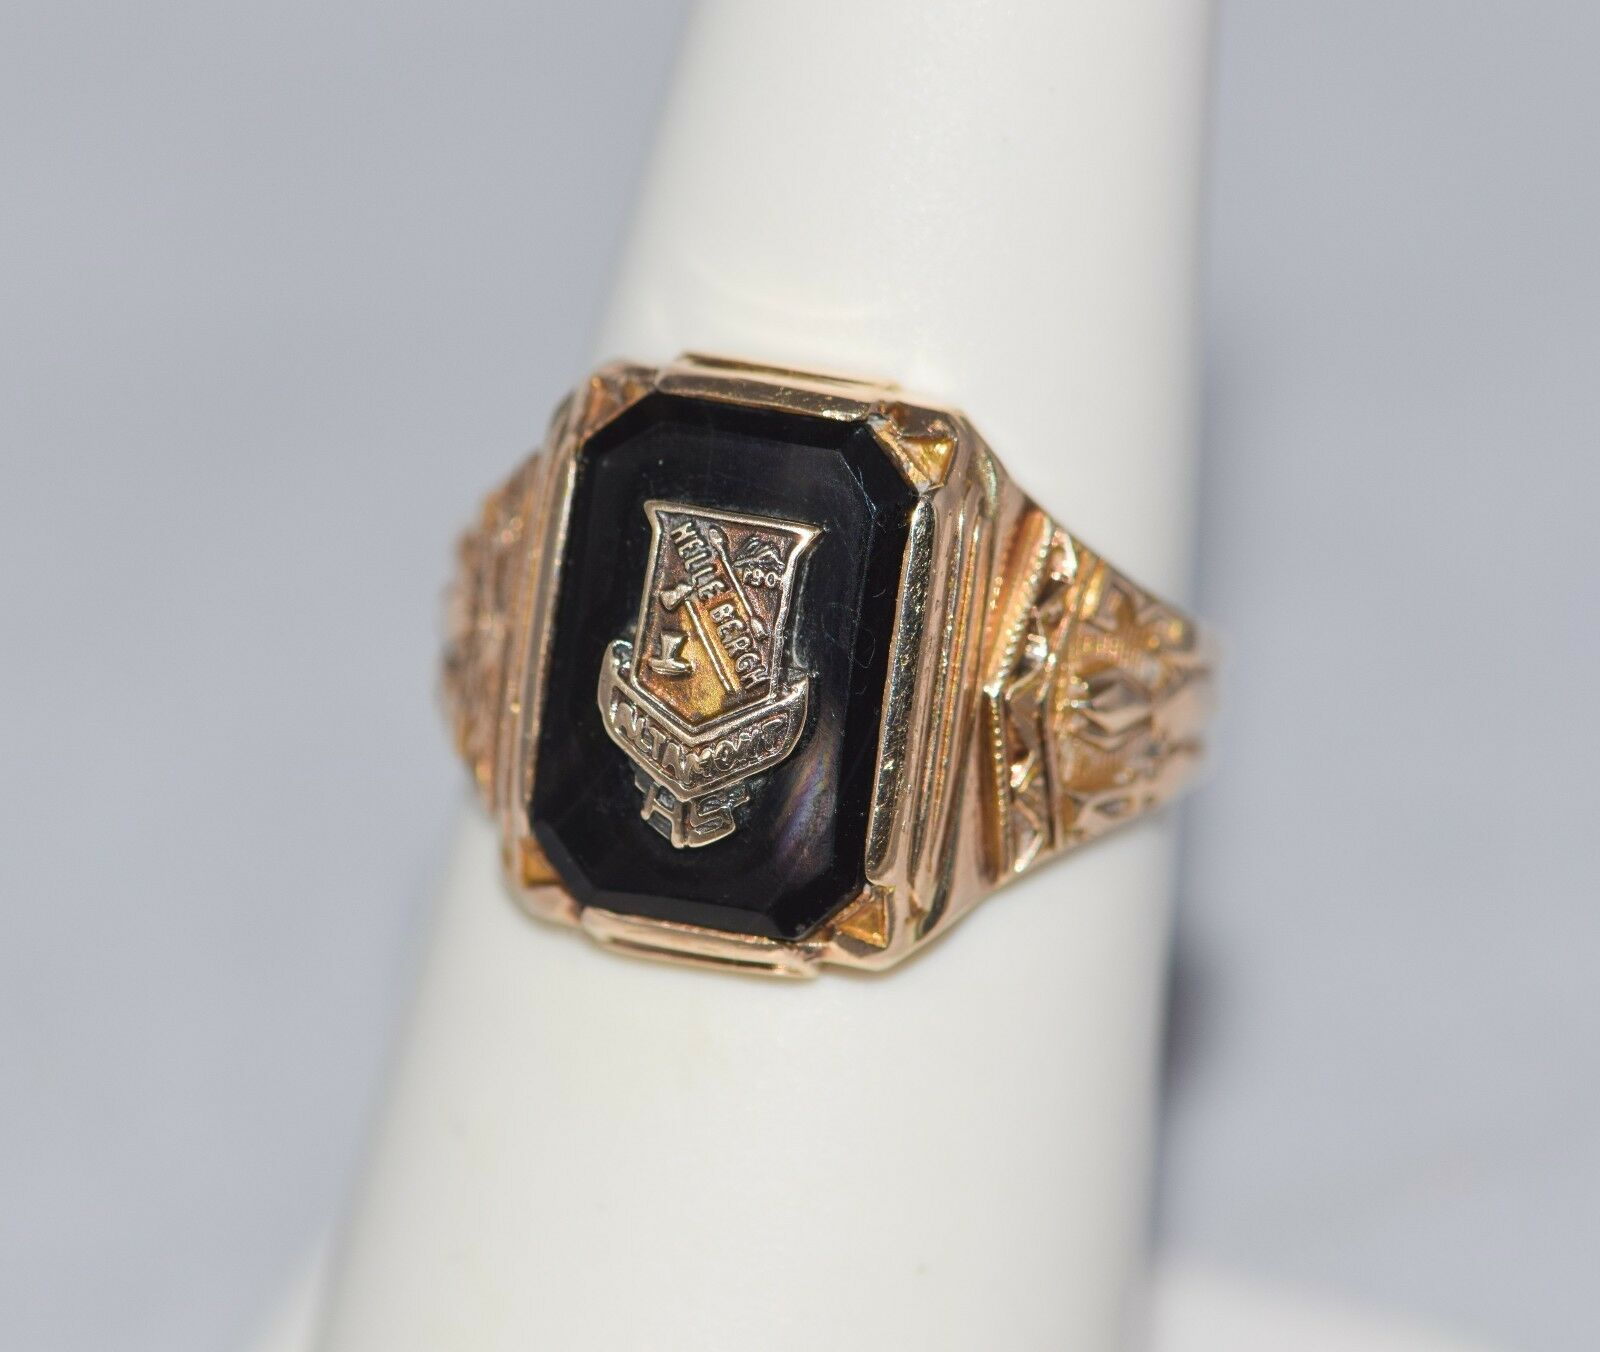 1943 Altamont High School Class Ring Size 5.25 Illinois Vintage